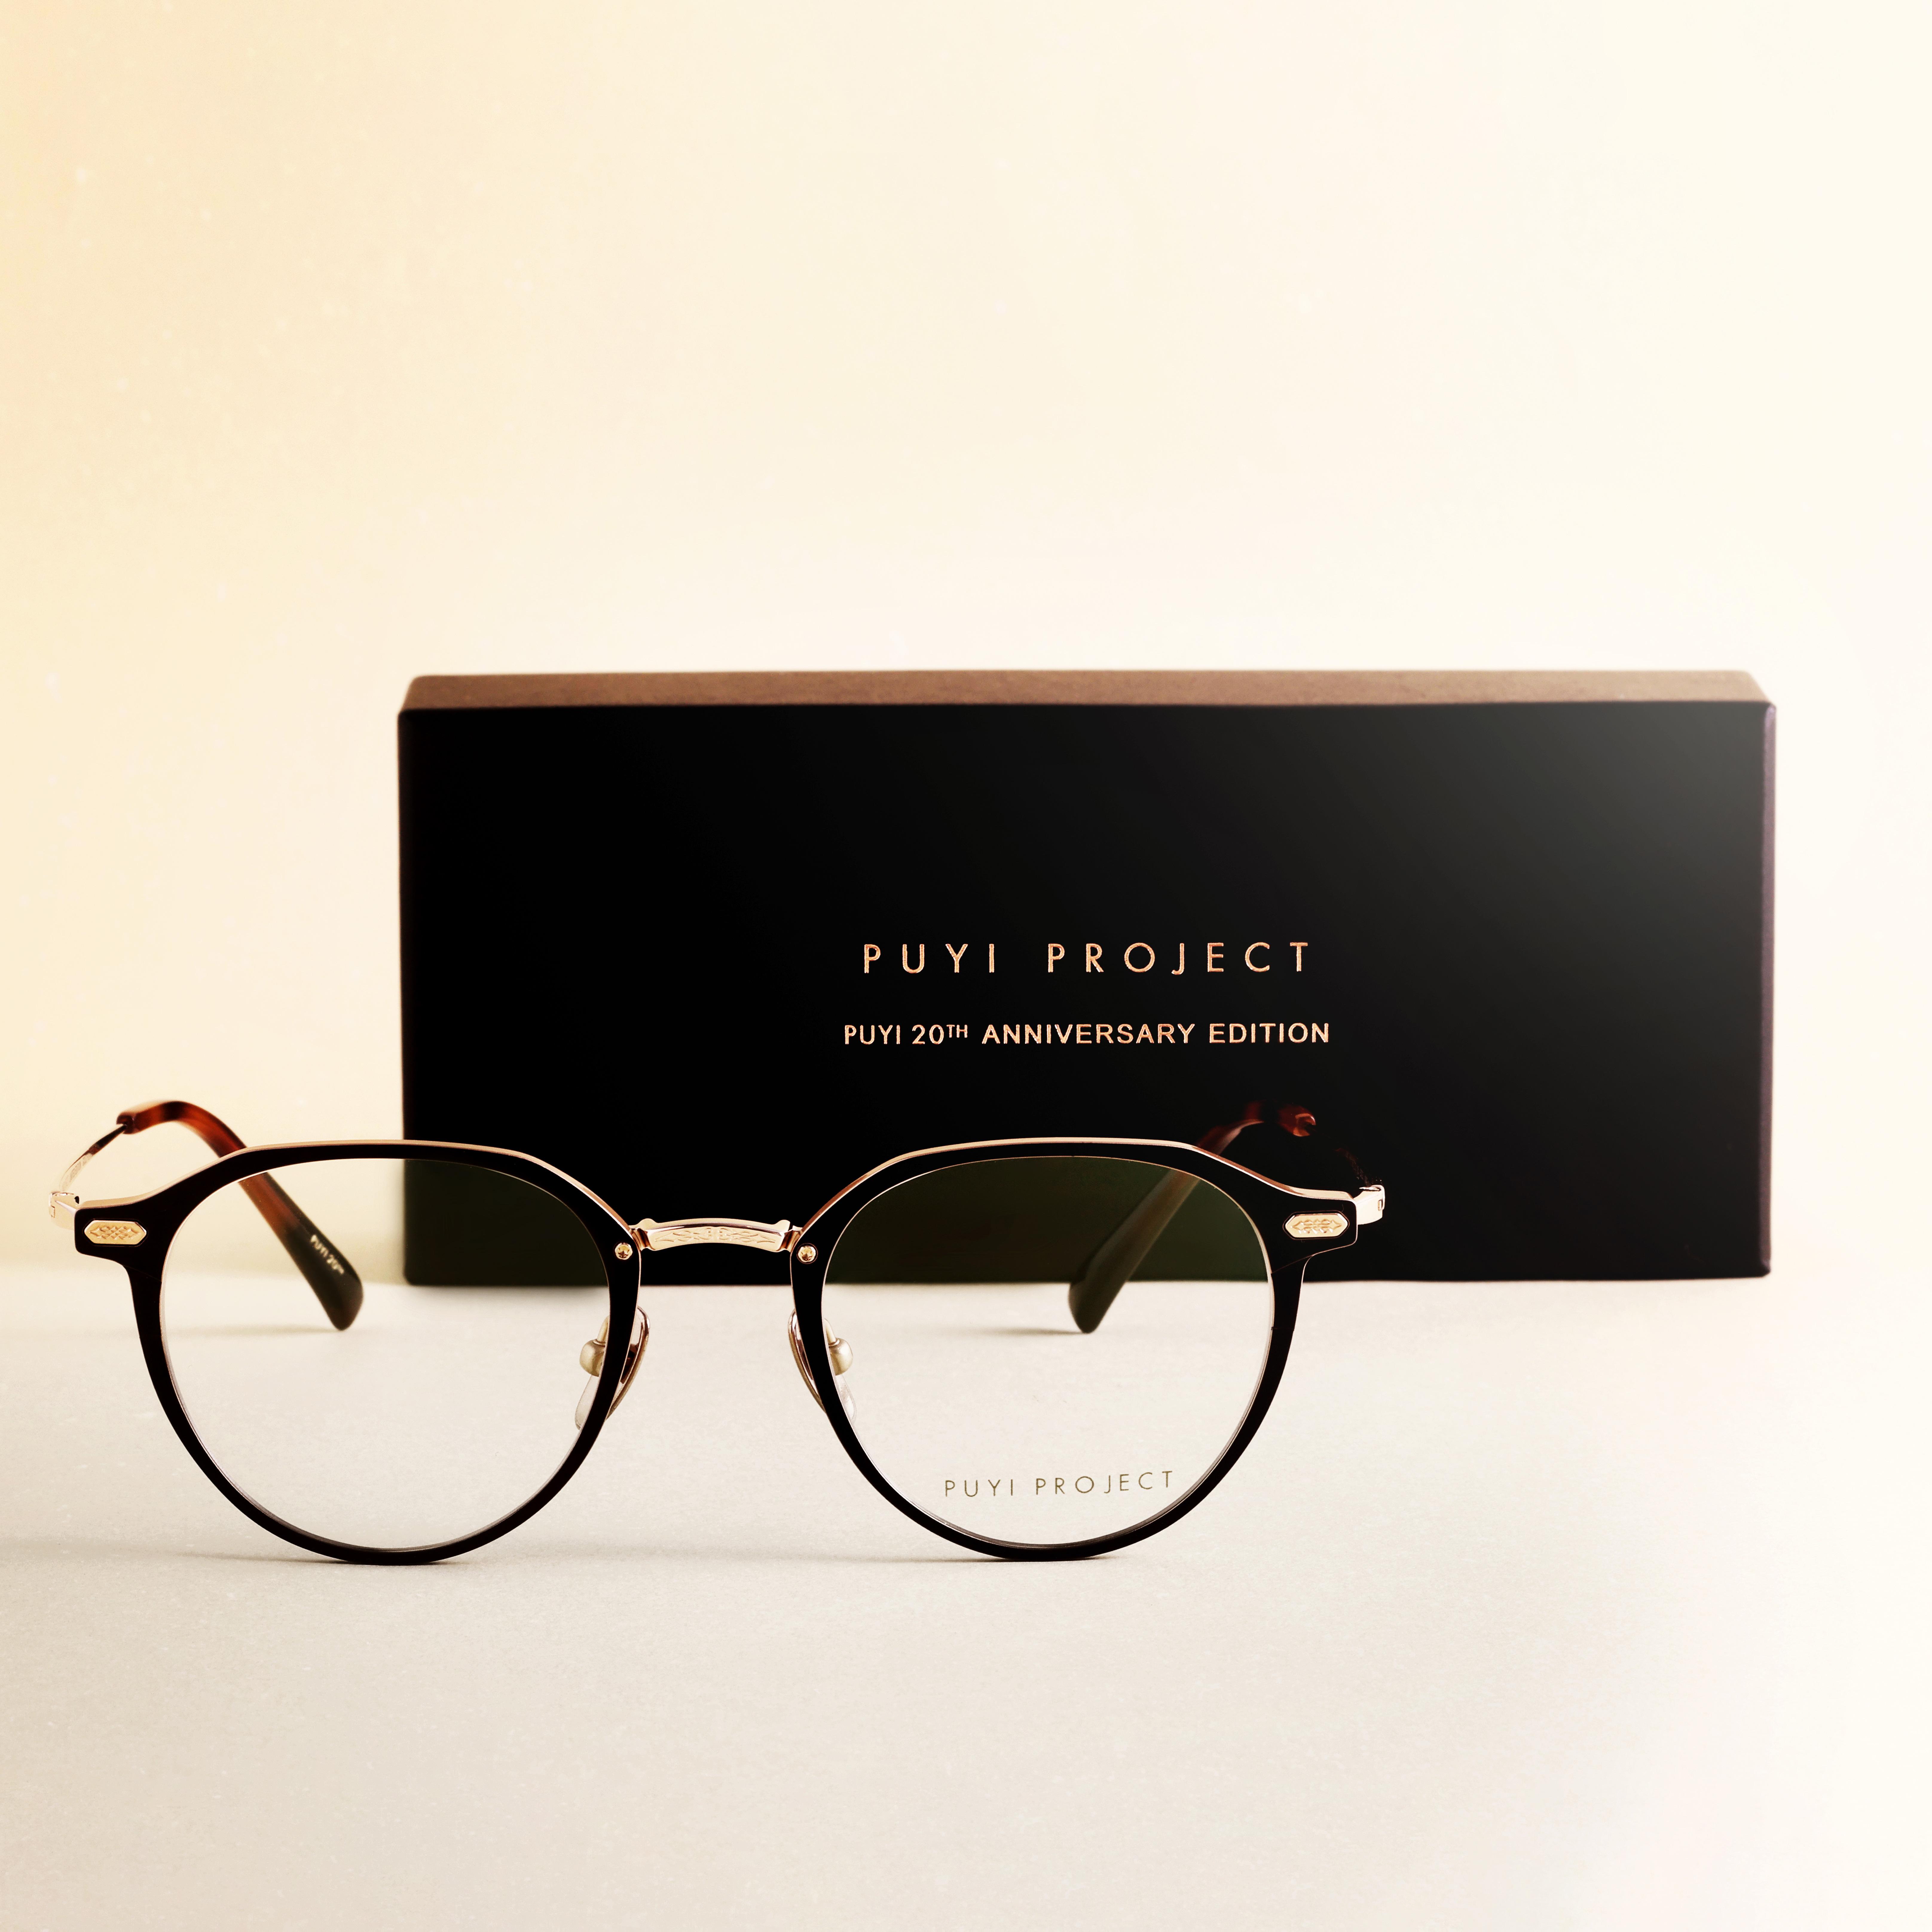 PUYI PROJECT 溥儀眼鏡20週年限量紀念款